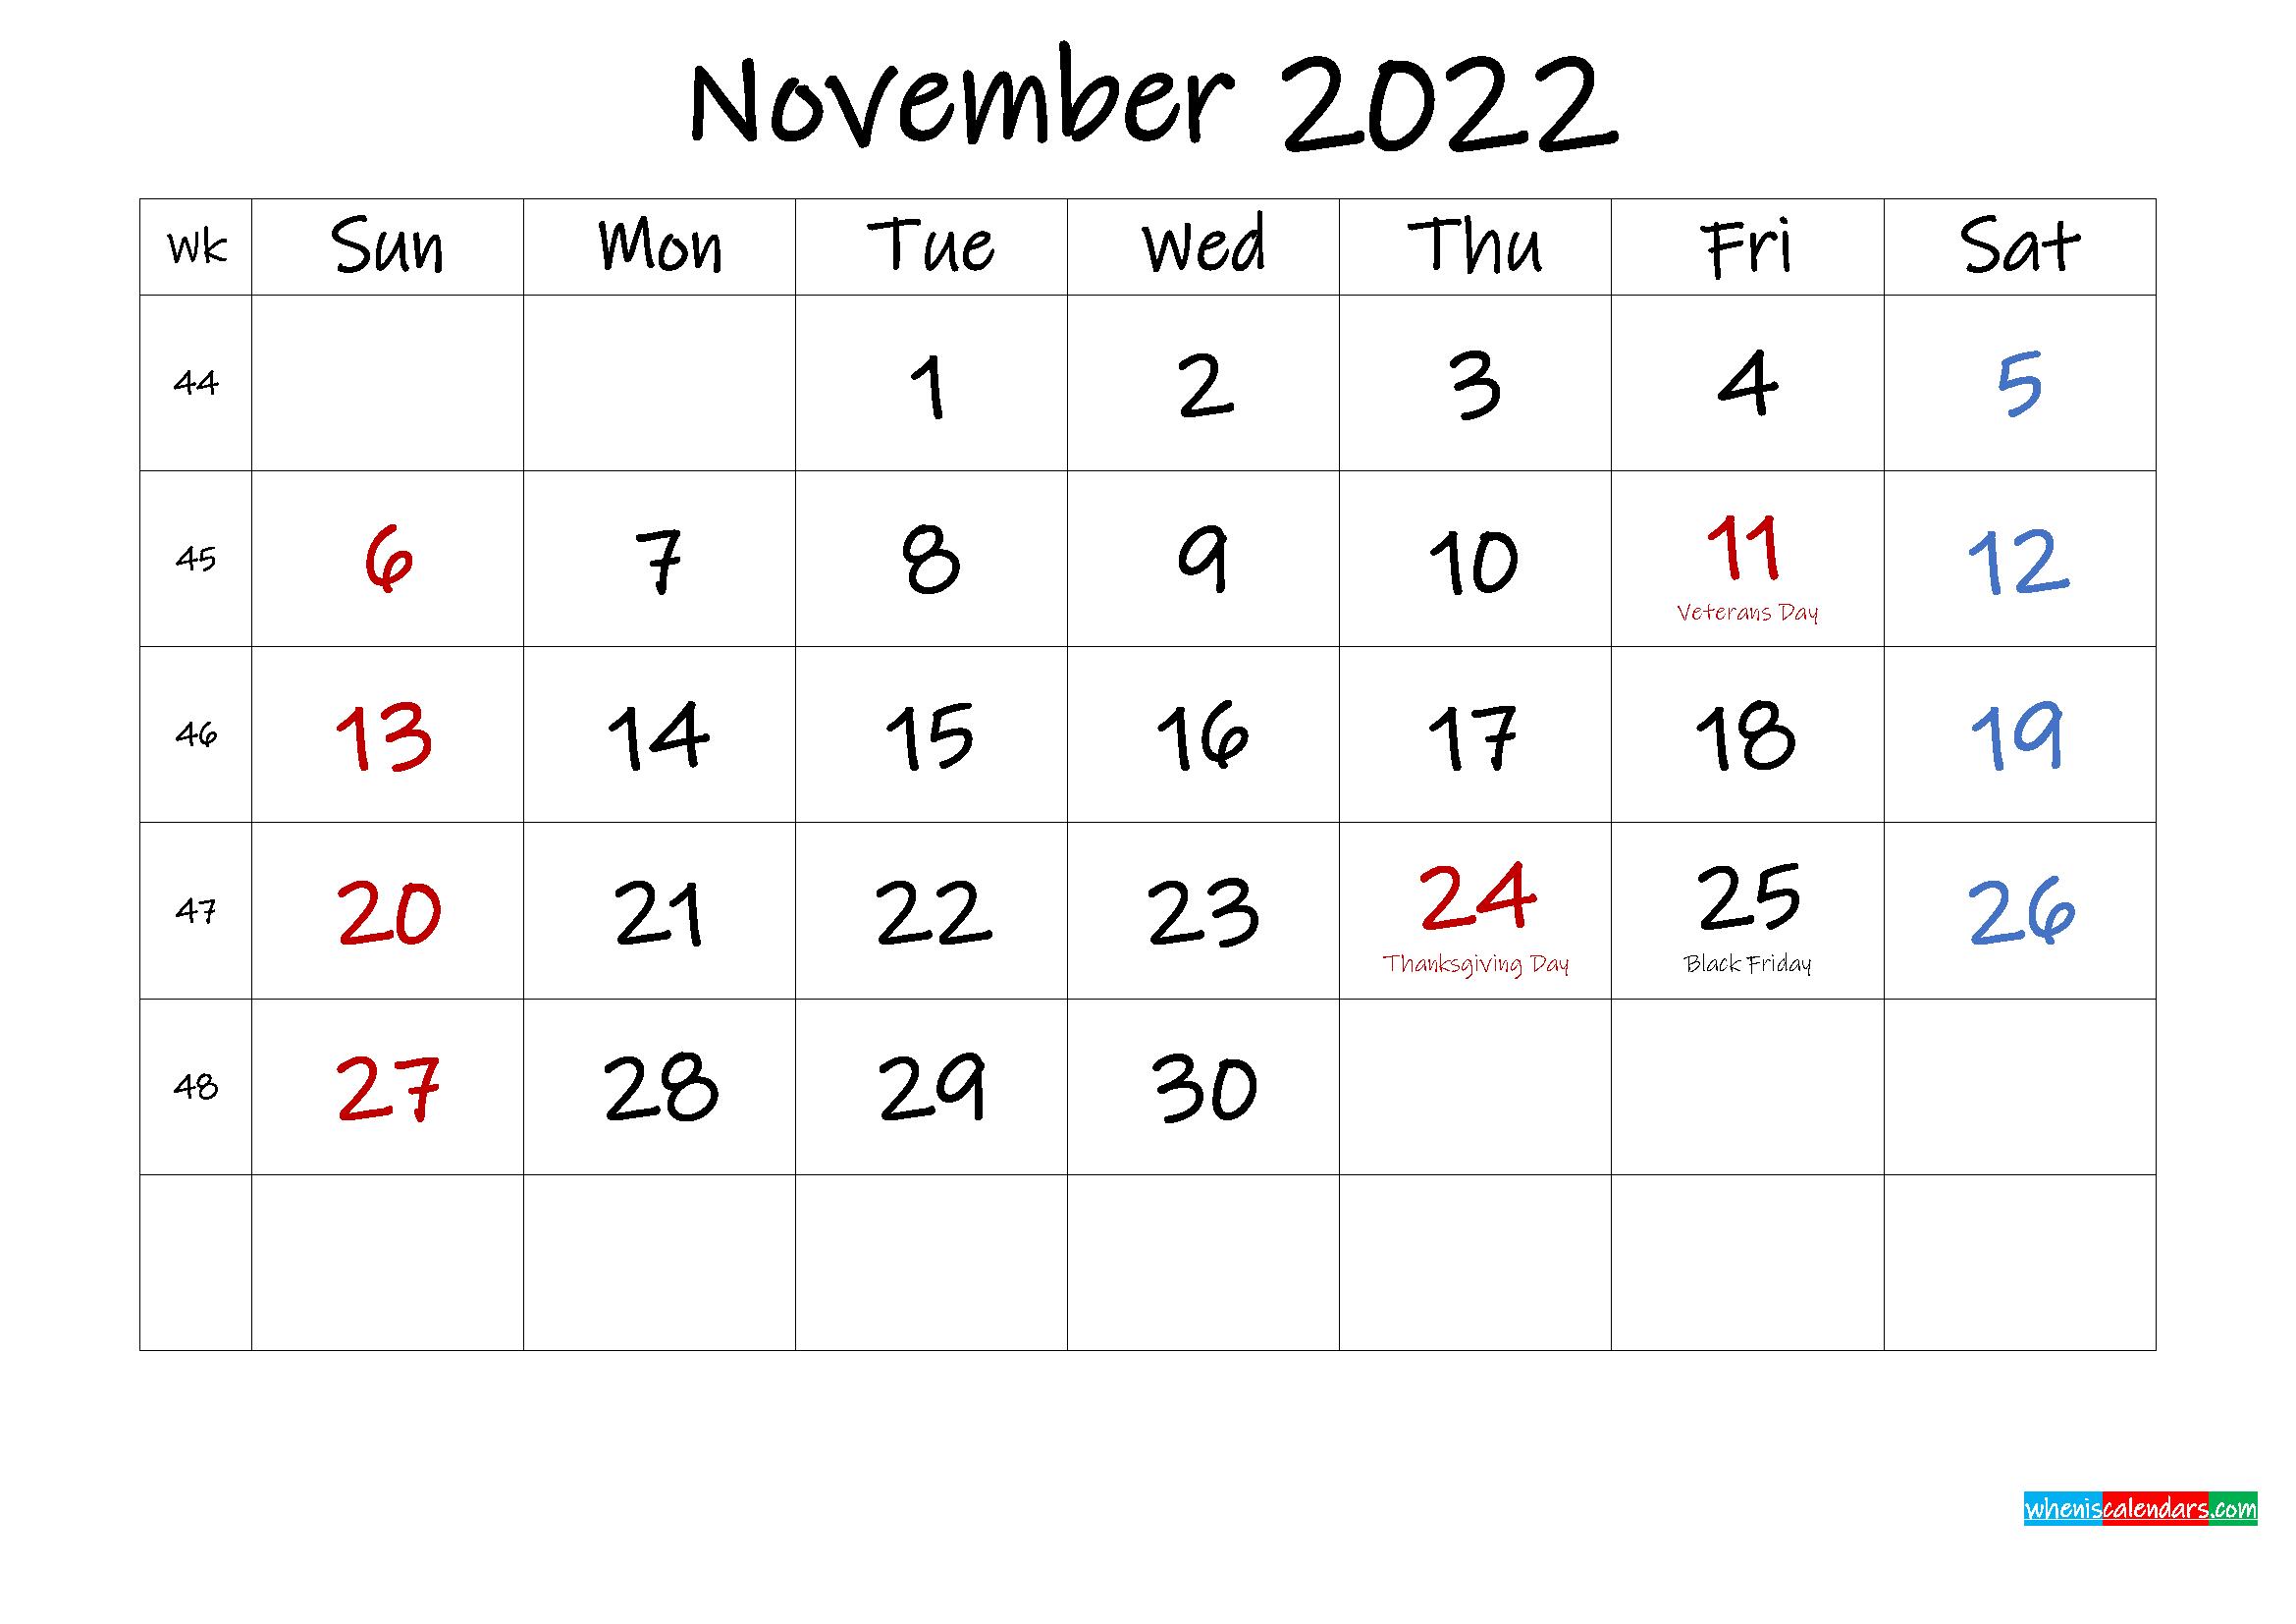 November 2022 Free Printable Calendar with Holidays